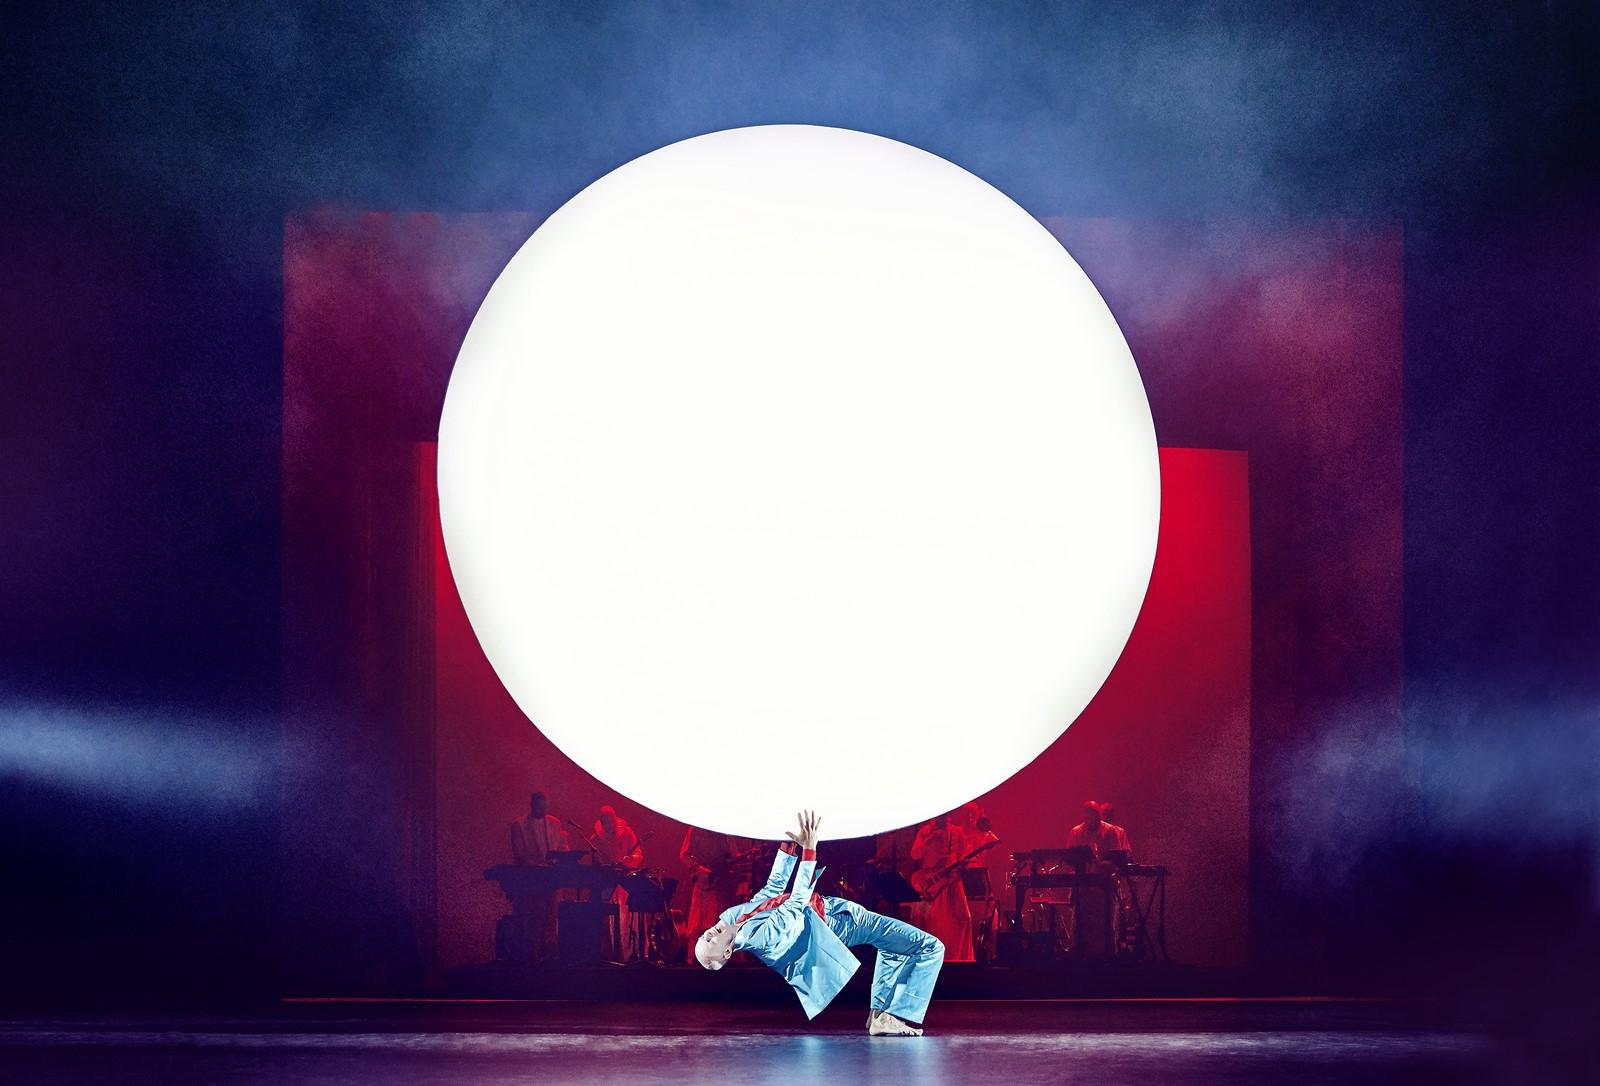 Anmeldelse: Lazarus, Aarhus Teater (Aarhus Teater, Det Kongelige Teater og Mikkel Rønnow)